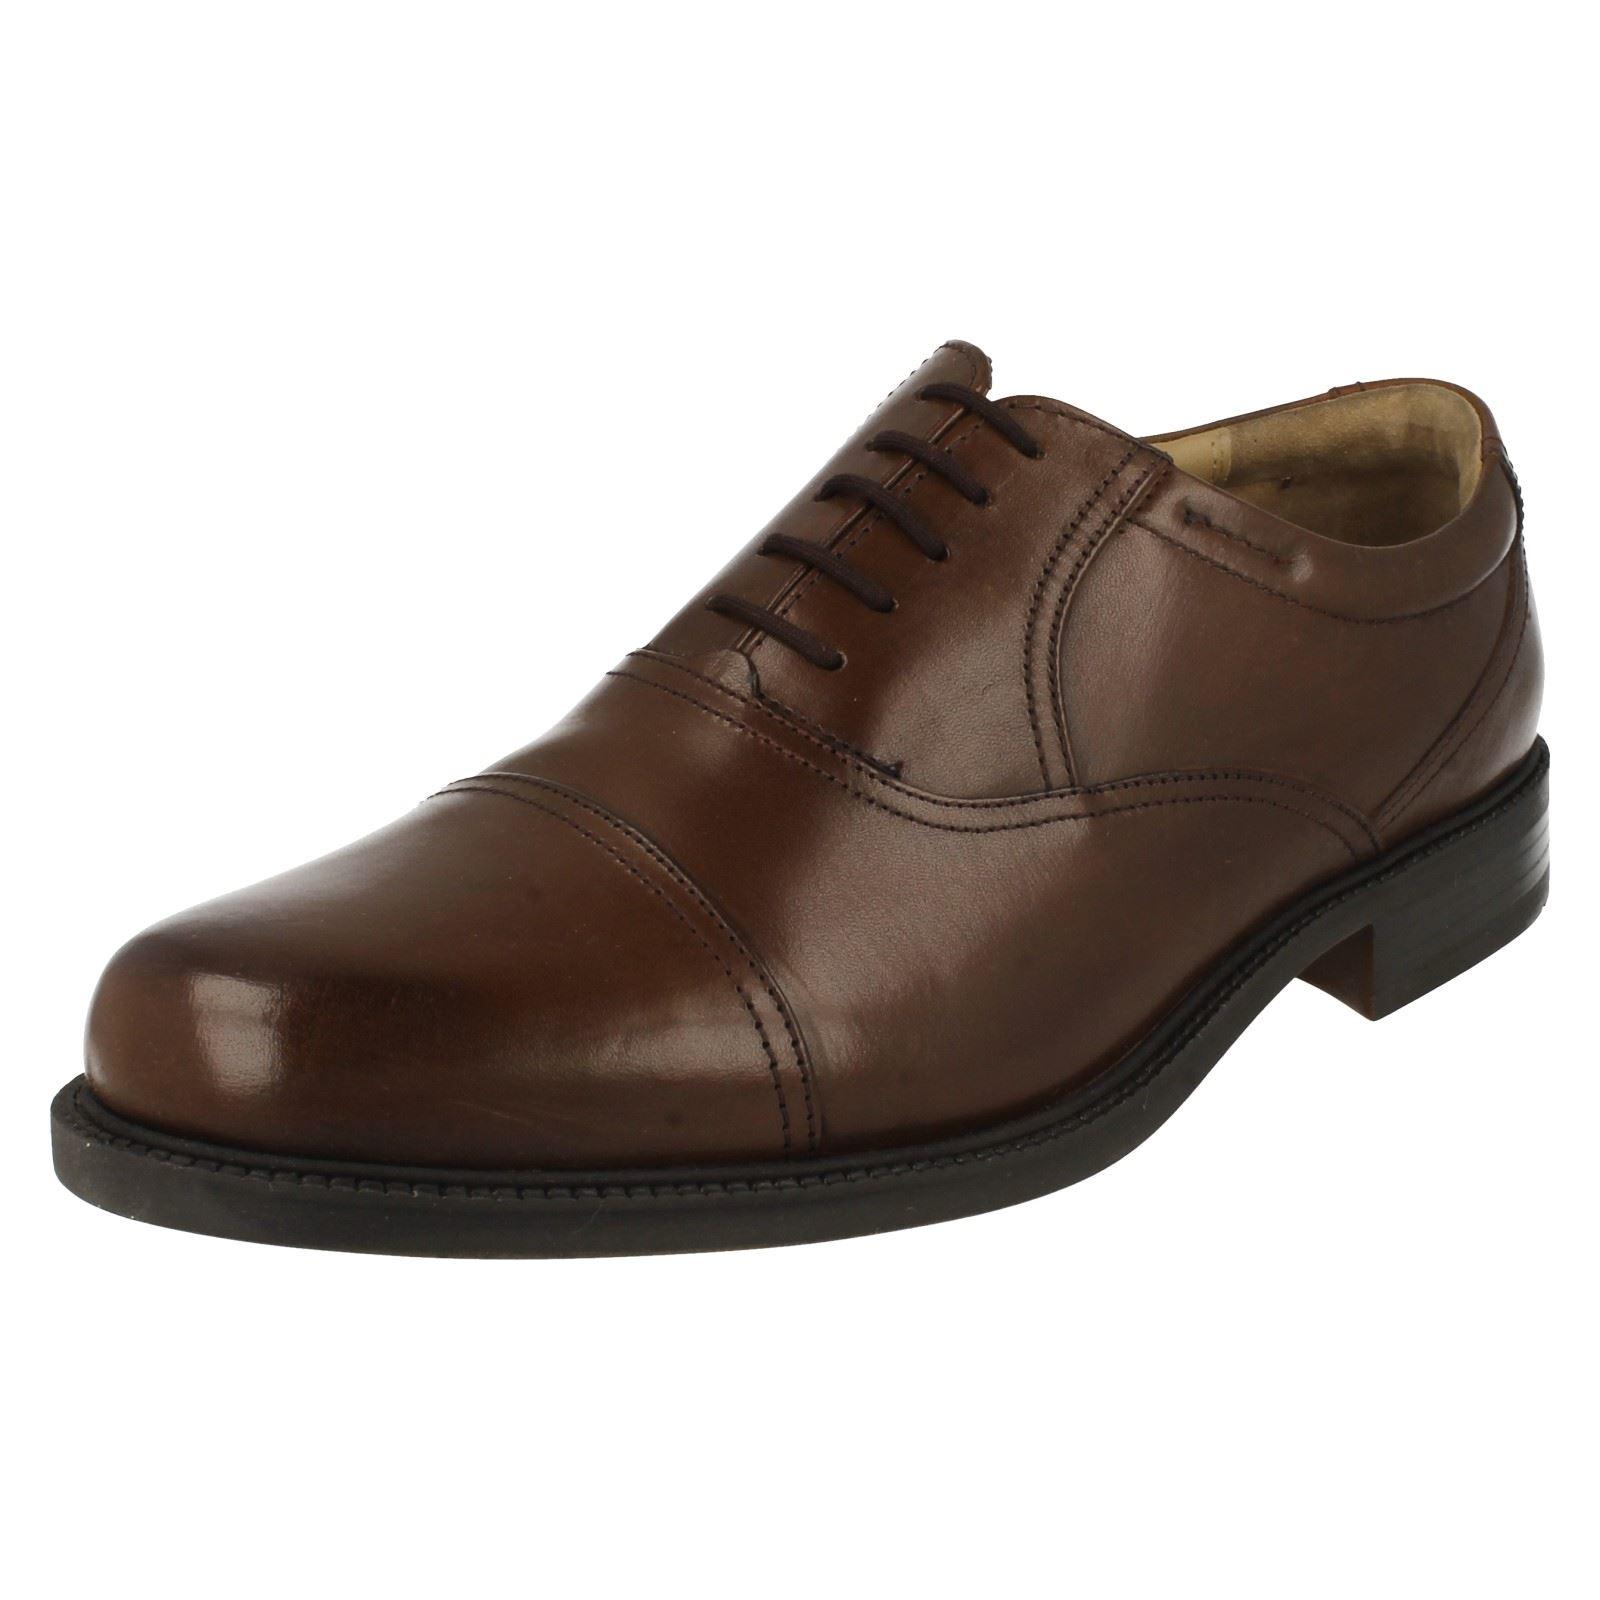 mens clarks formal oxford shoes bravo